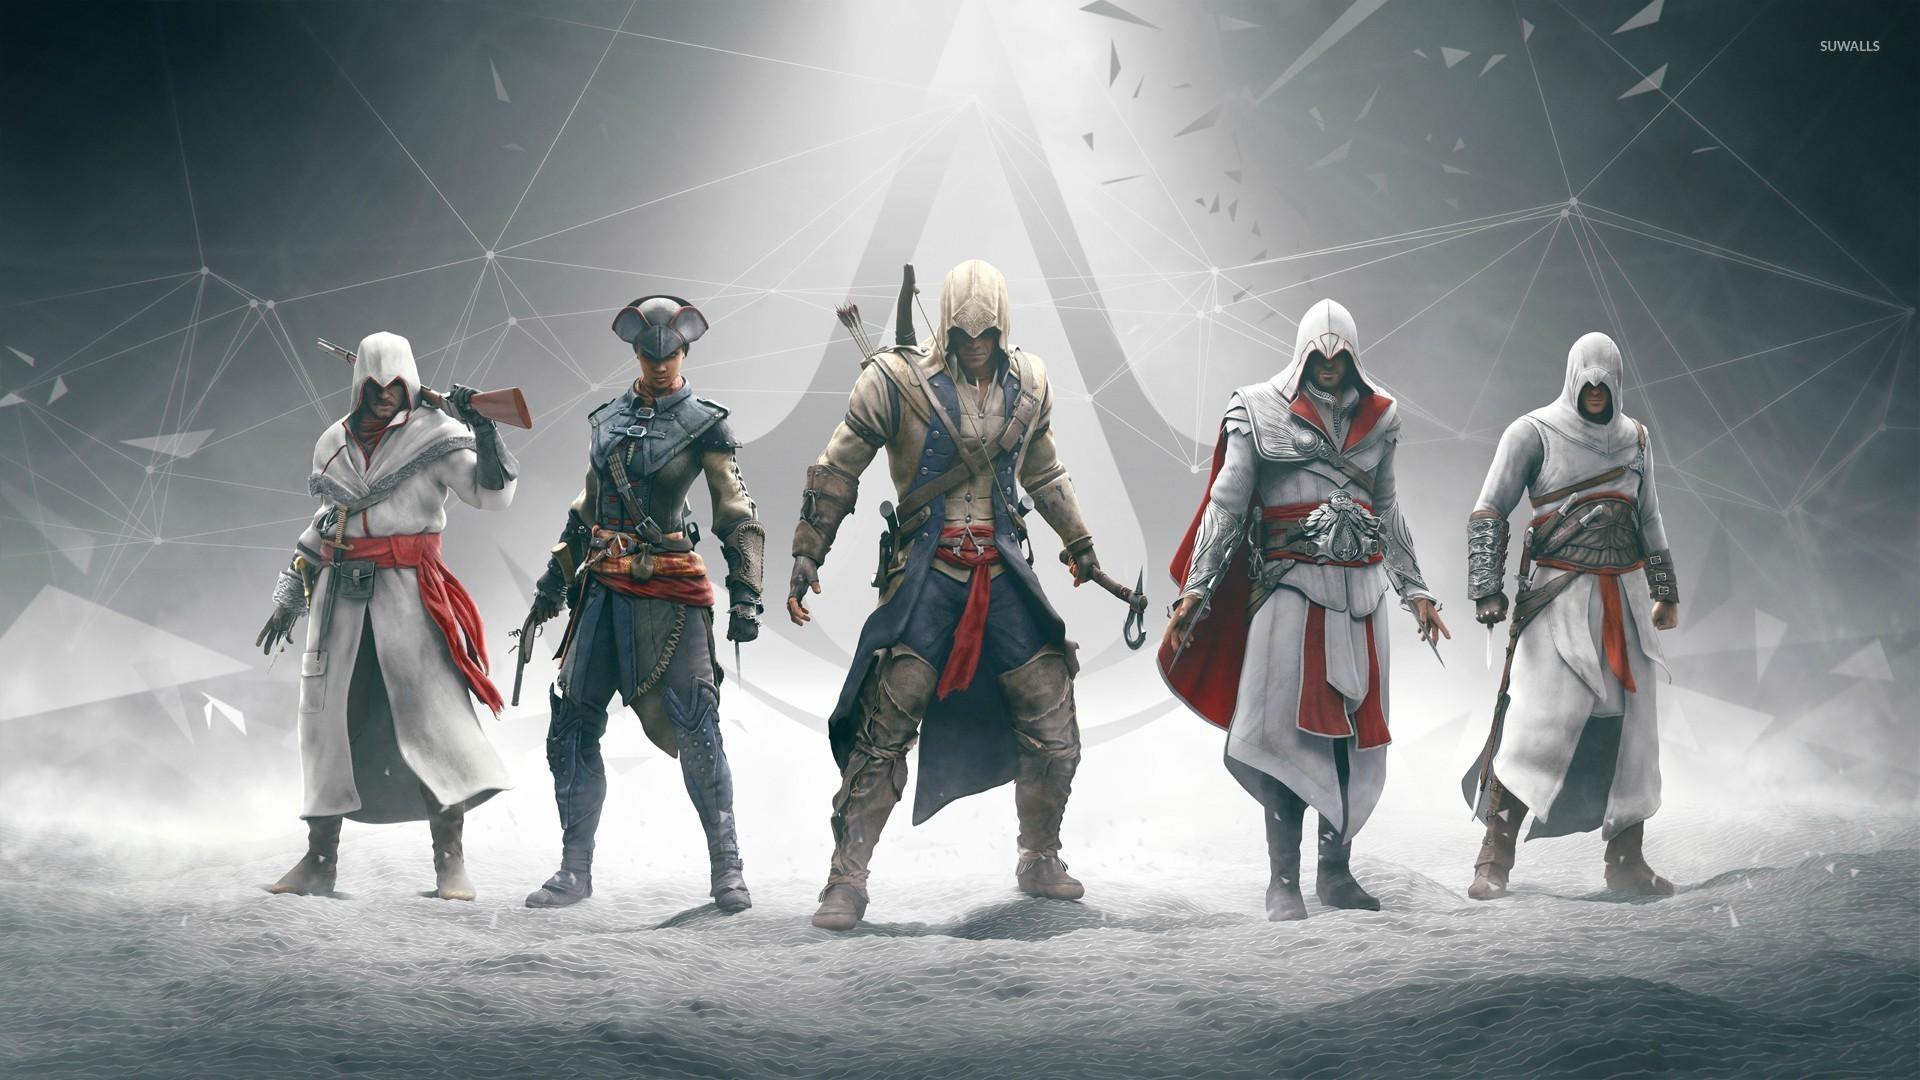 Assassins Creed Brotherhood 3 Wallpaper Game